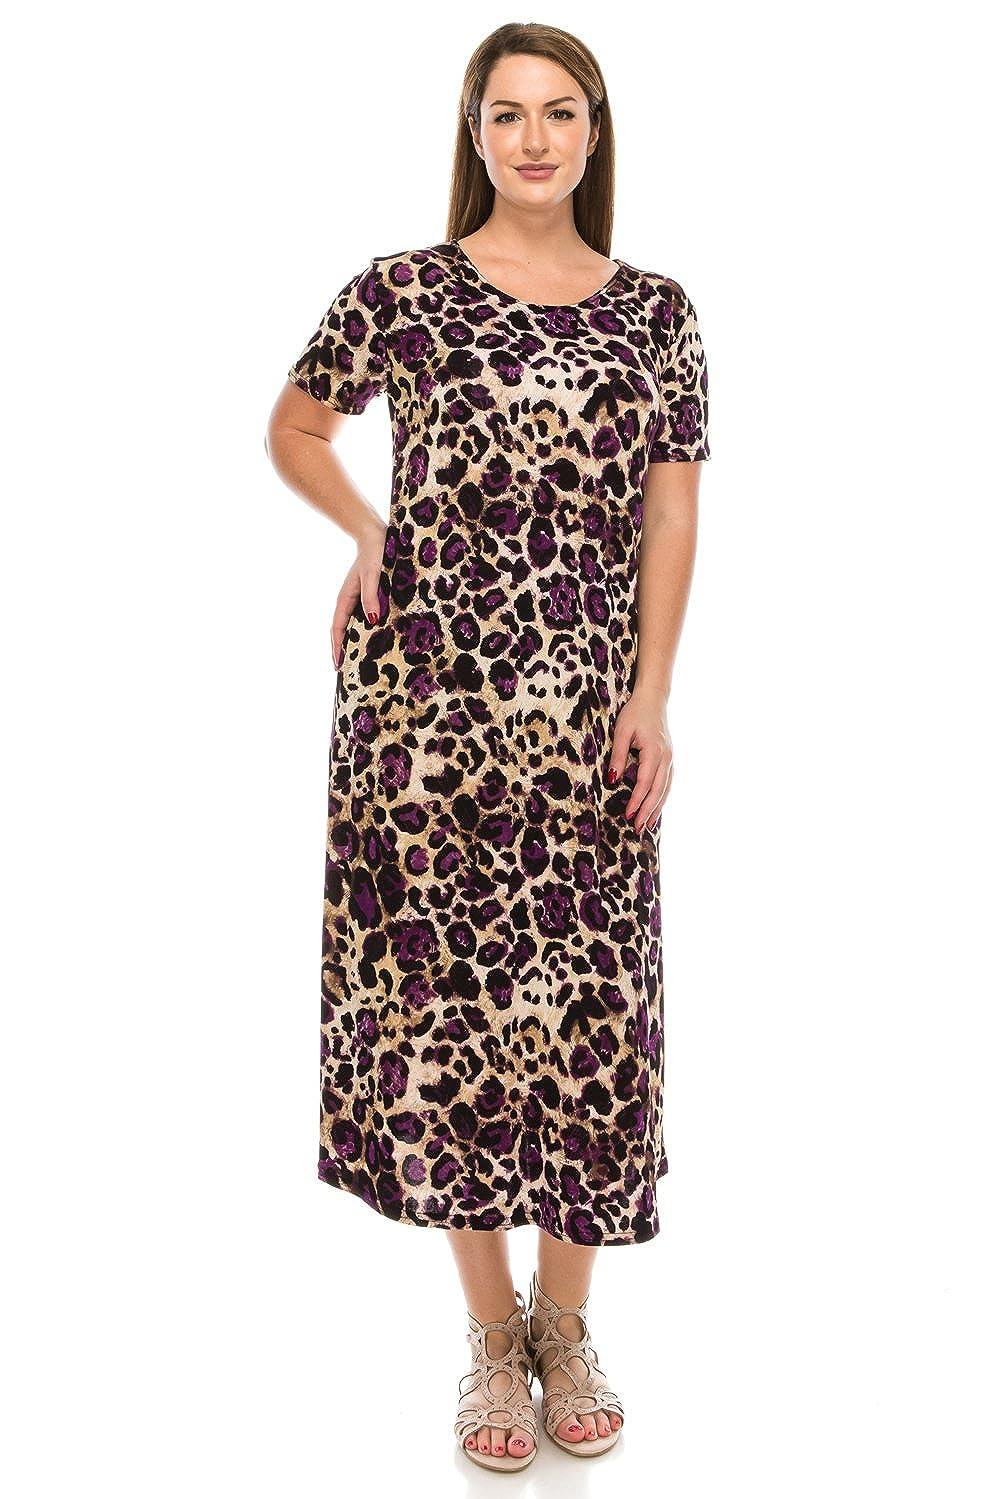 W088 Purple Jostar Women's Stretchy Long Dress Short Sleeve Print